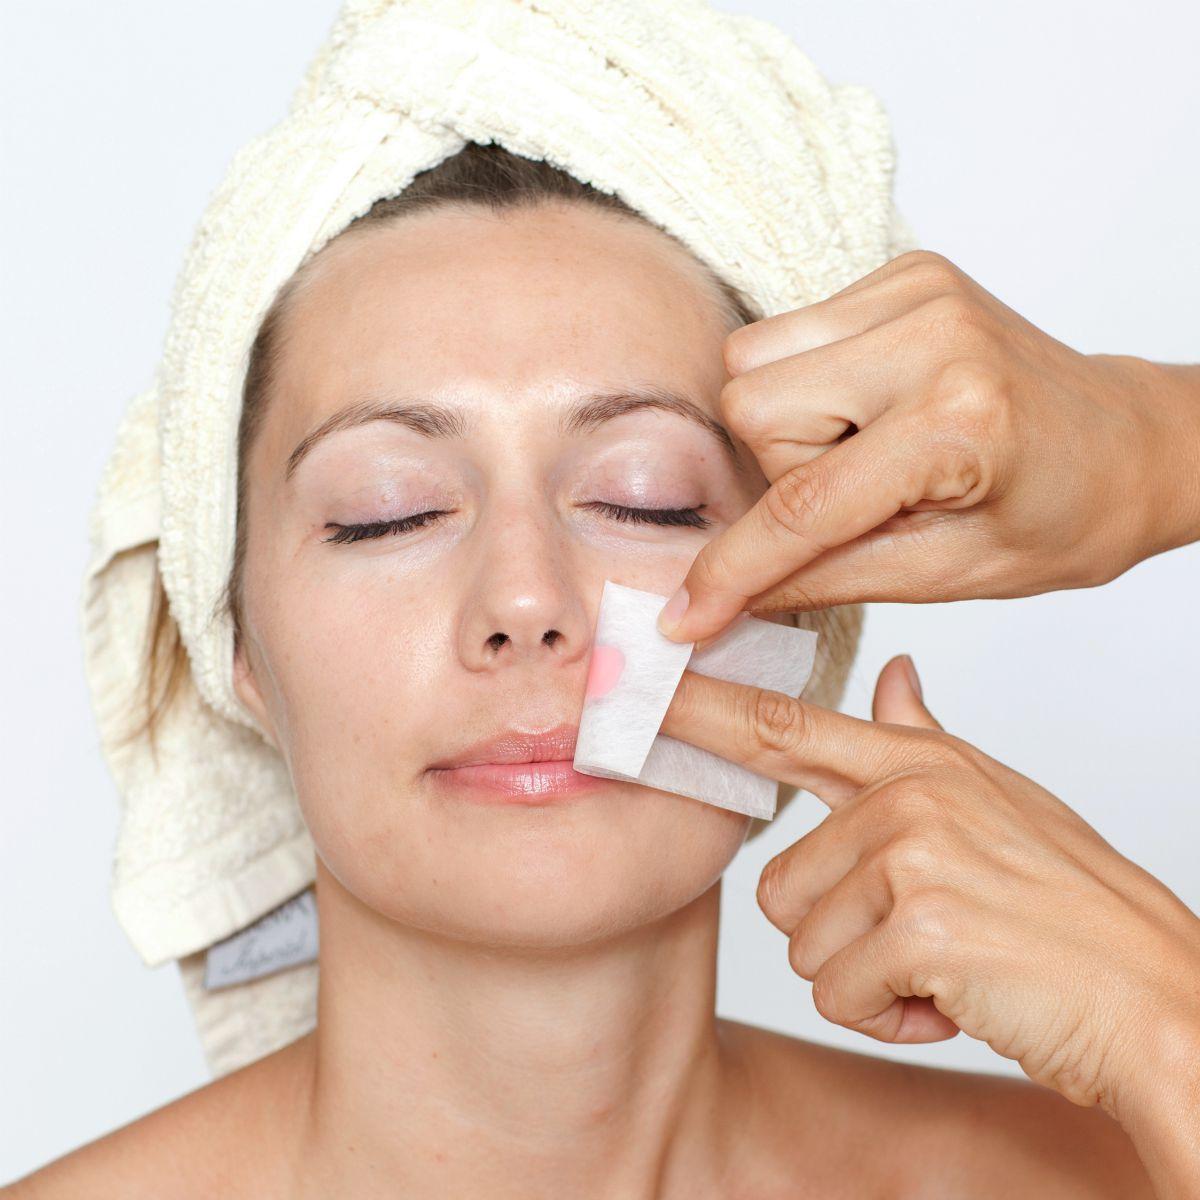 Facial hair nj salon, short mexican woman naked